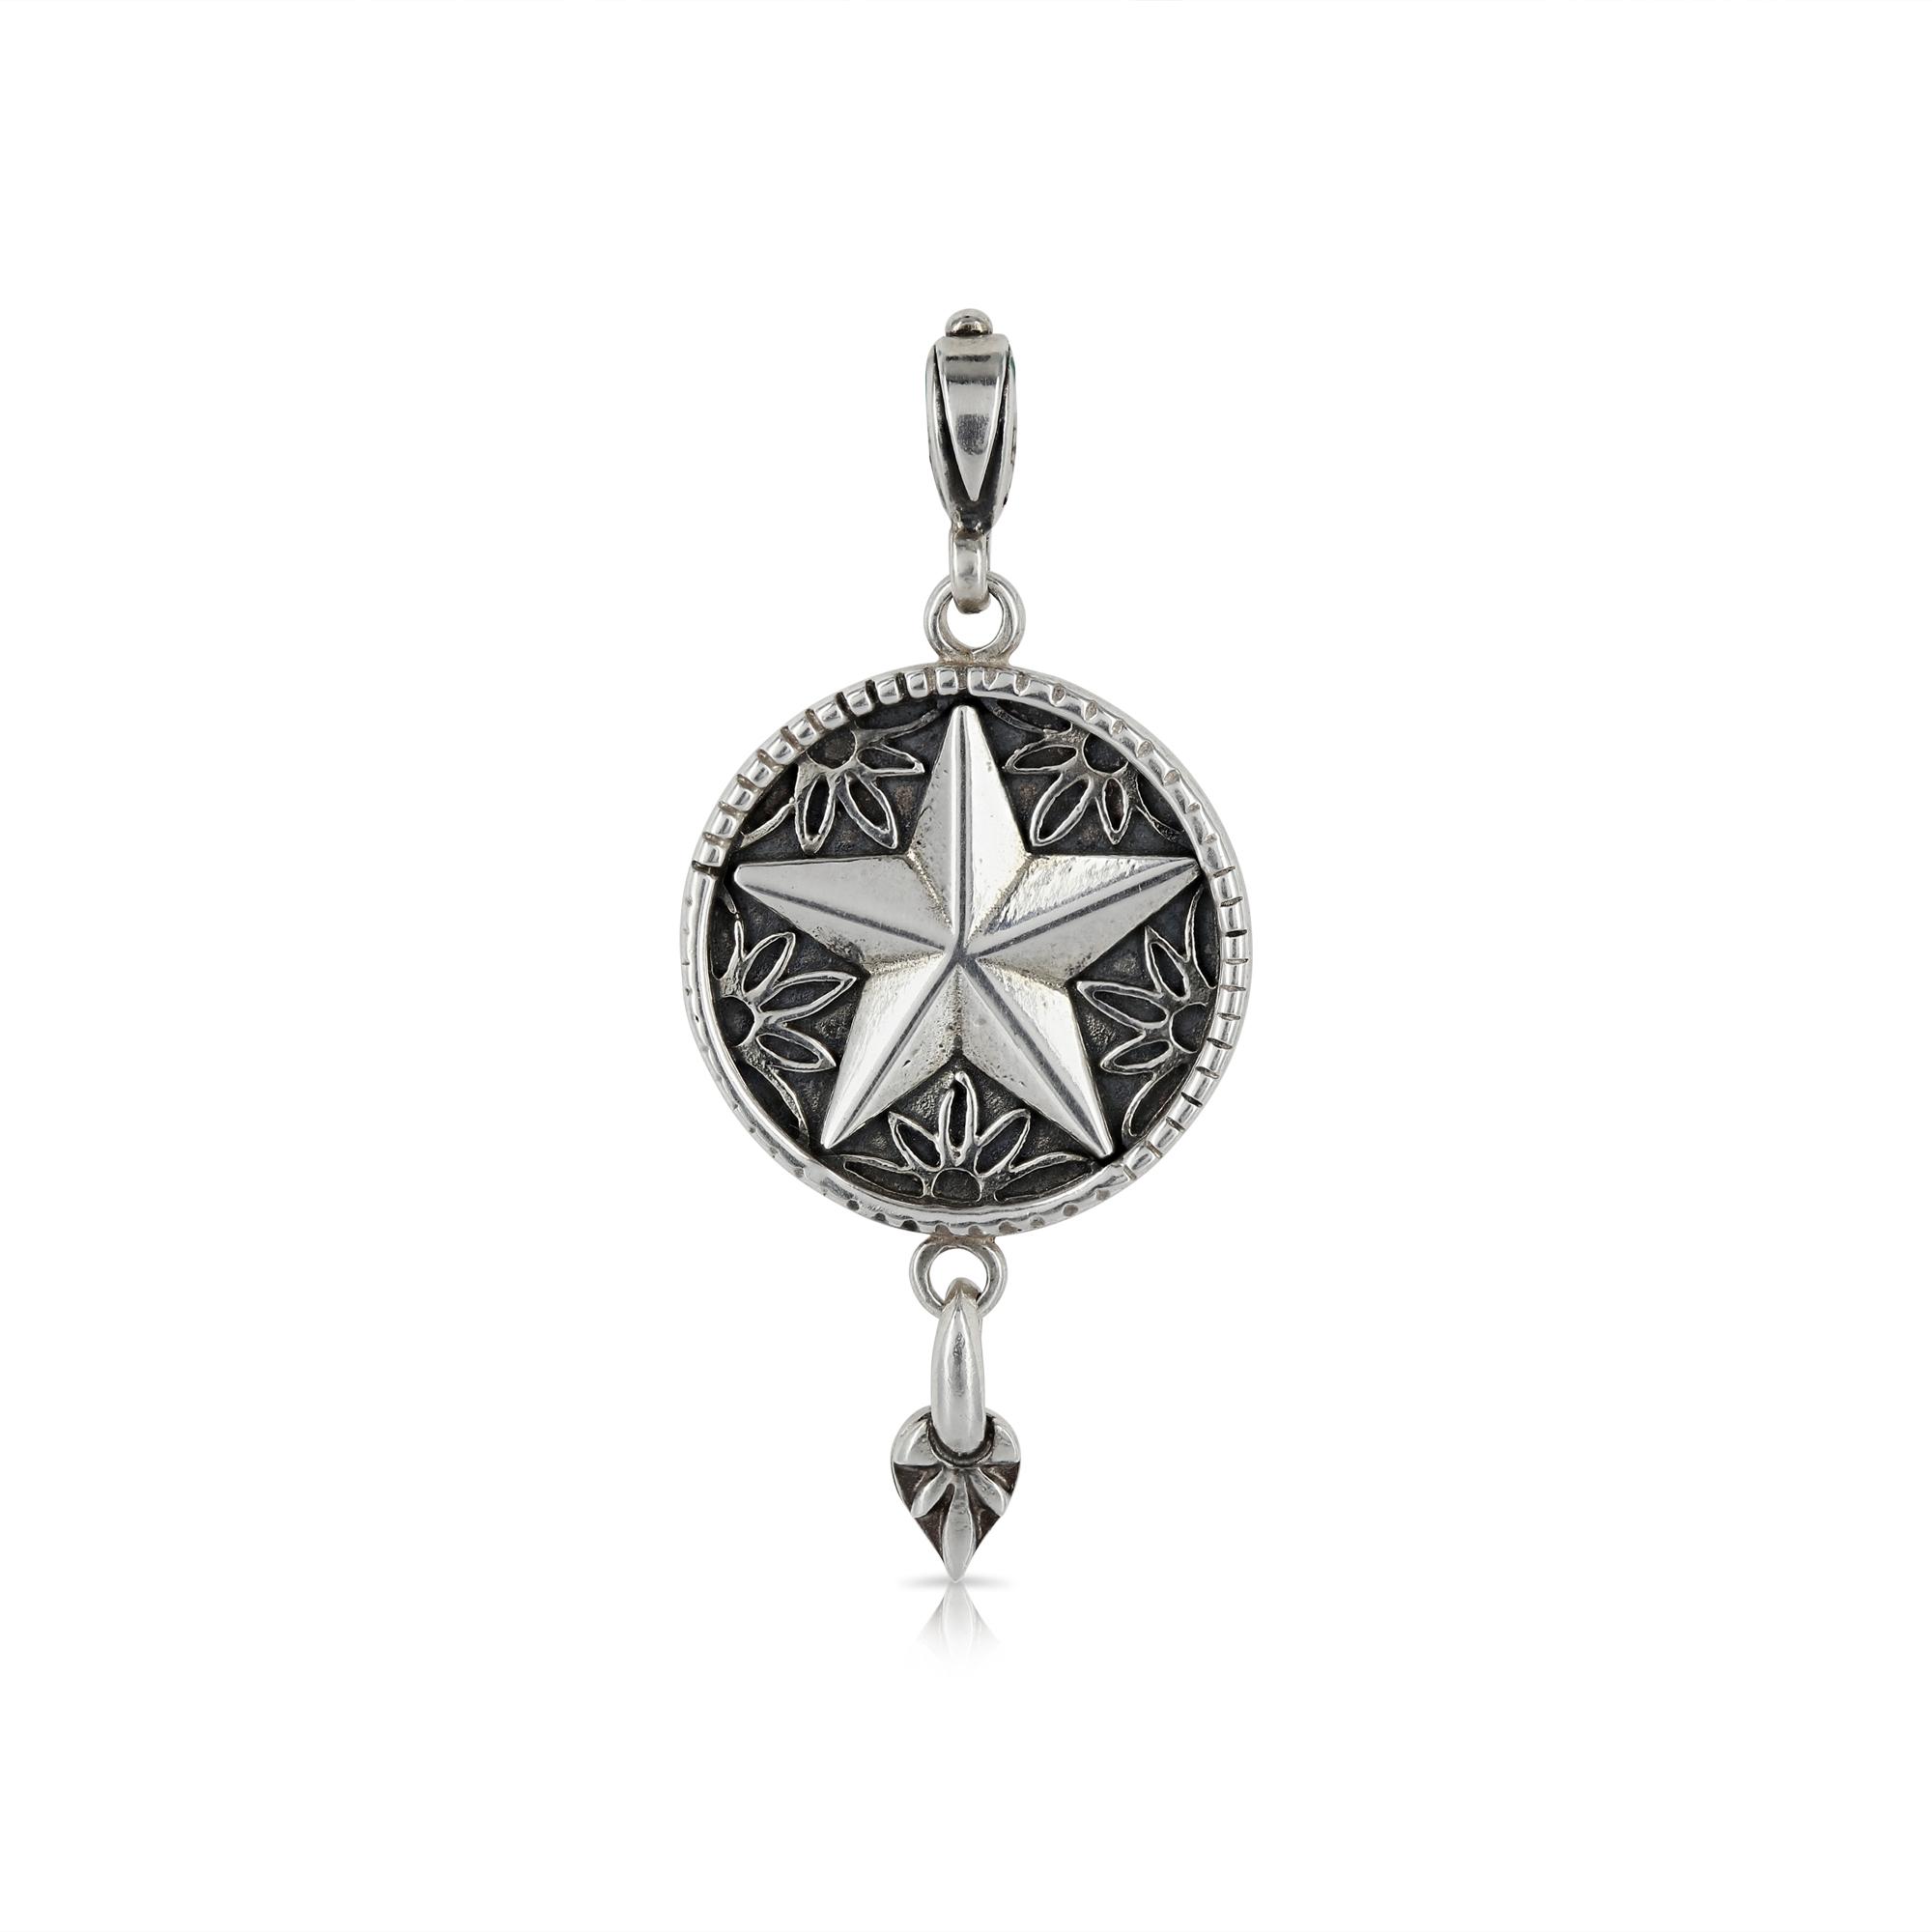 Silver star pendant prey jewellery silver star pendant by prey jewellery aloadofball Choice Image